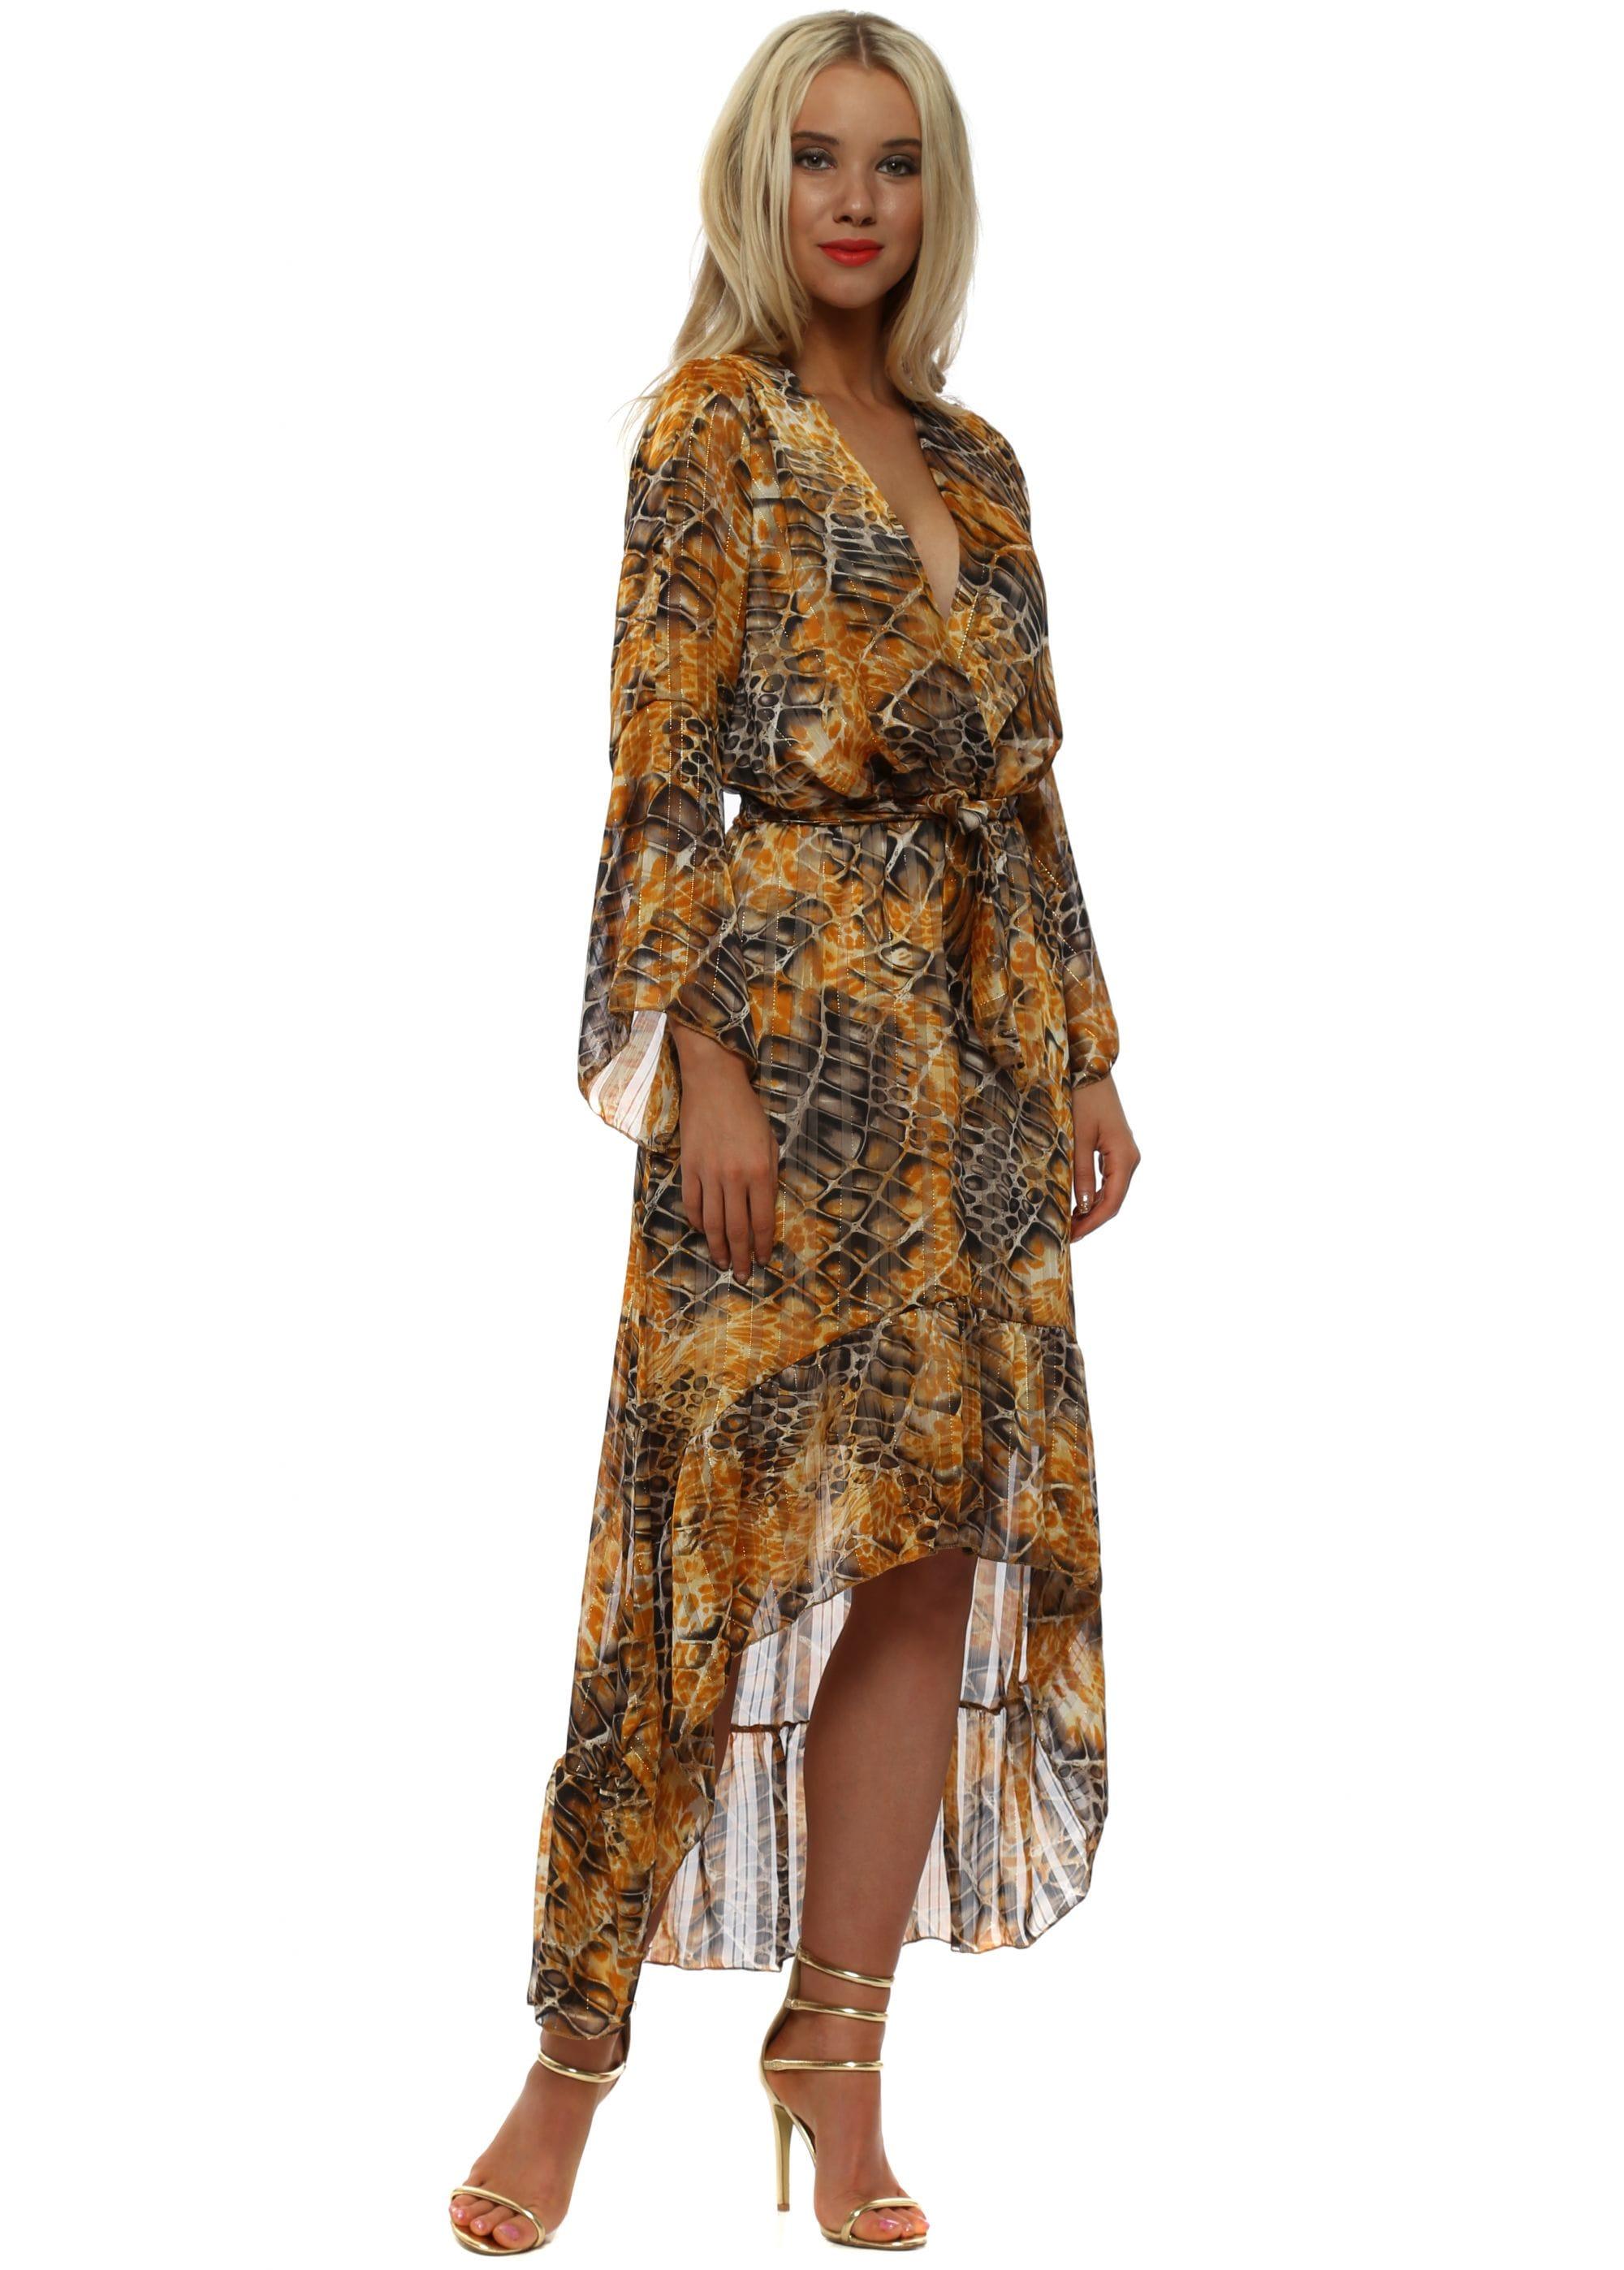 ce17989517e Amber Moc Croc Print High Low Wrap Dress